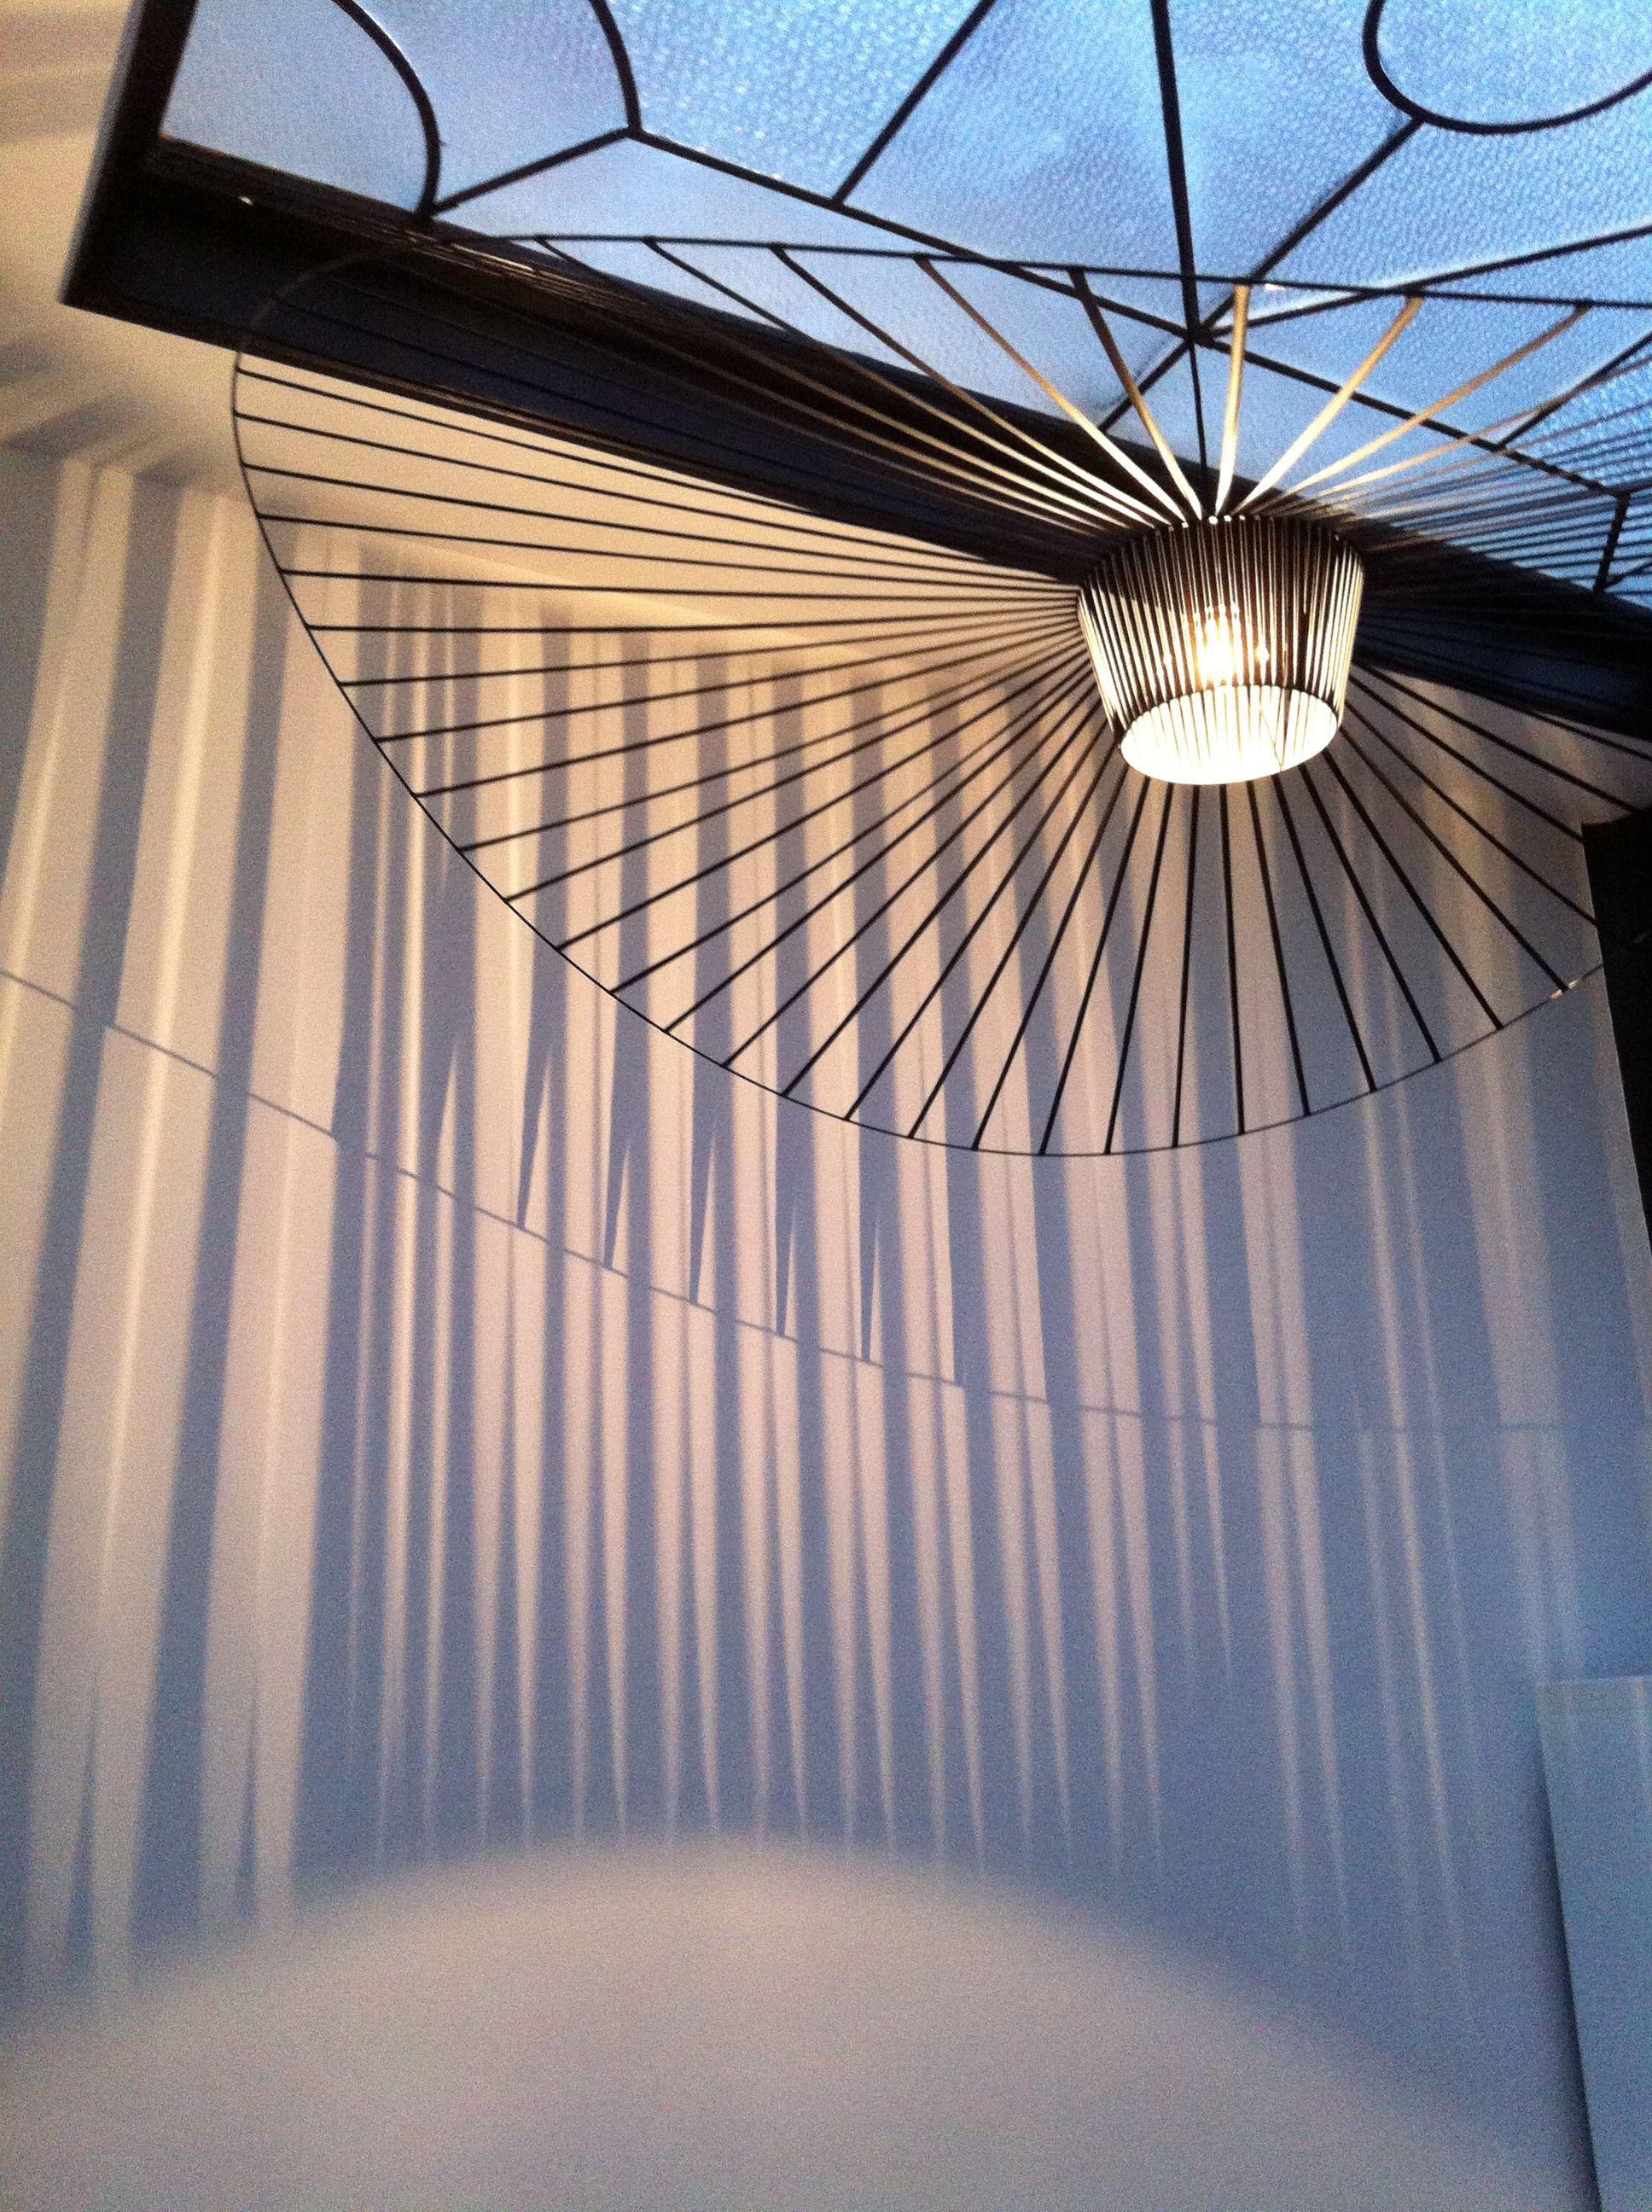 Suspension Grande Vertigo Noire de Petite Friture dans Maison de